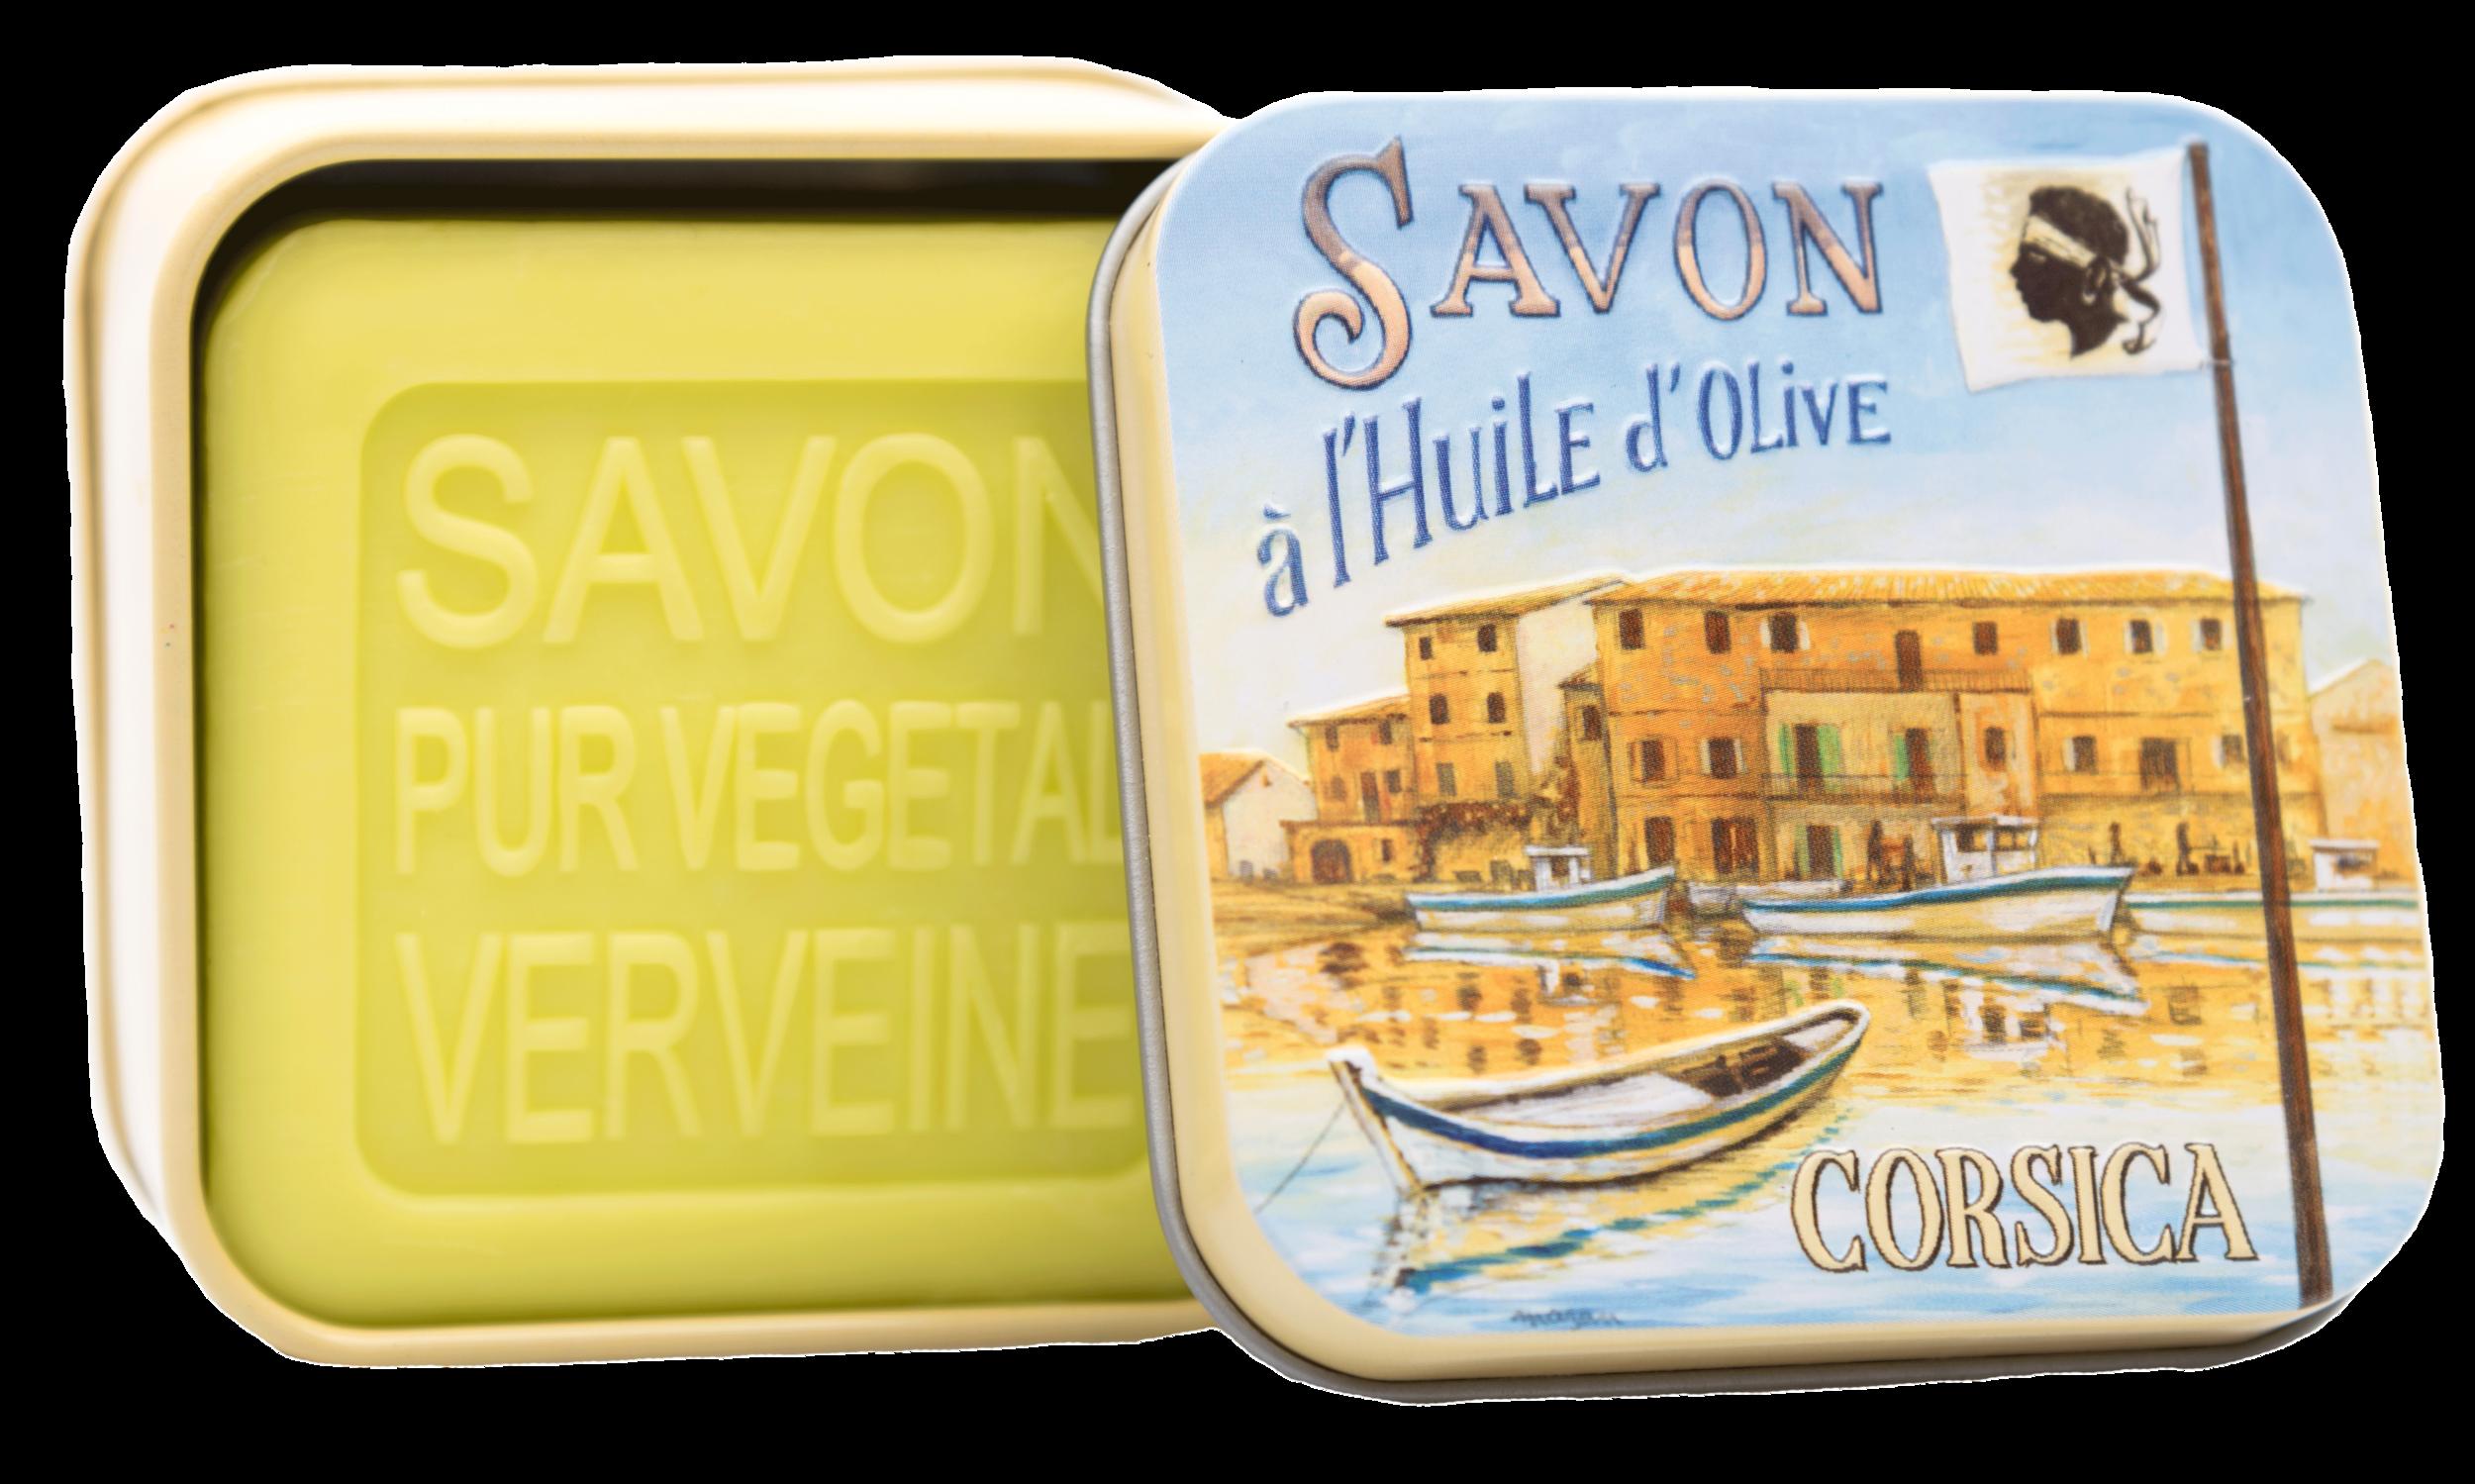 Boîte Métal Port Corse & Savon 100g